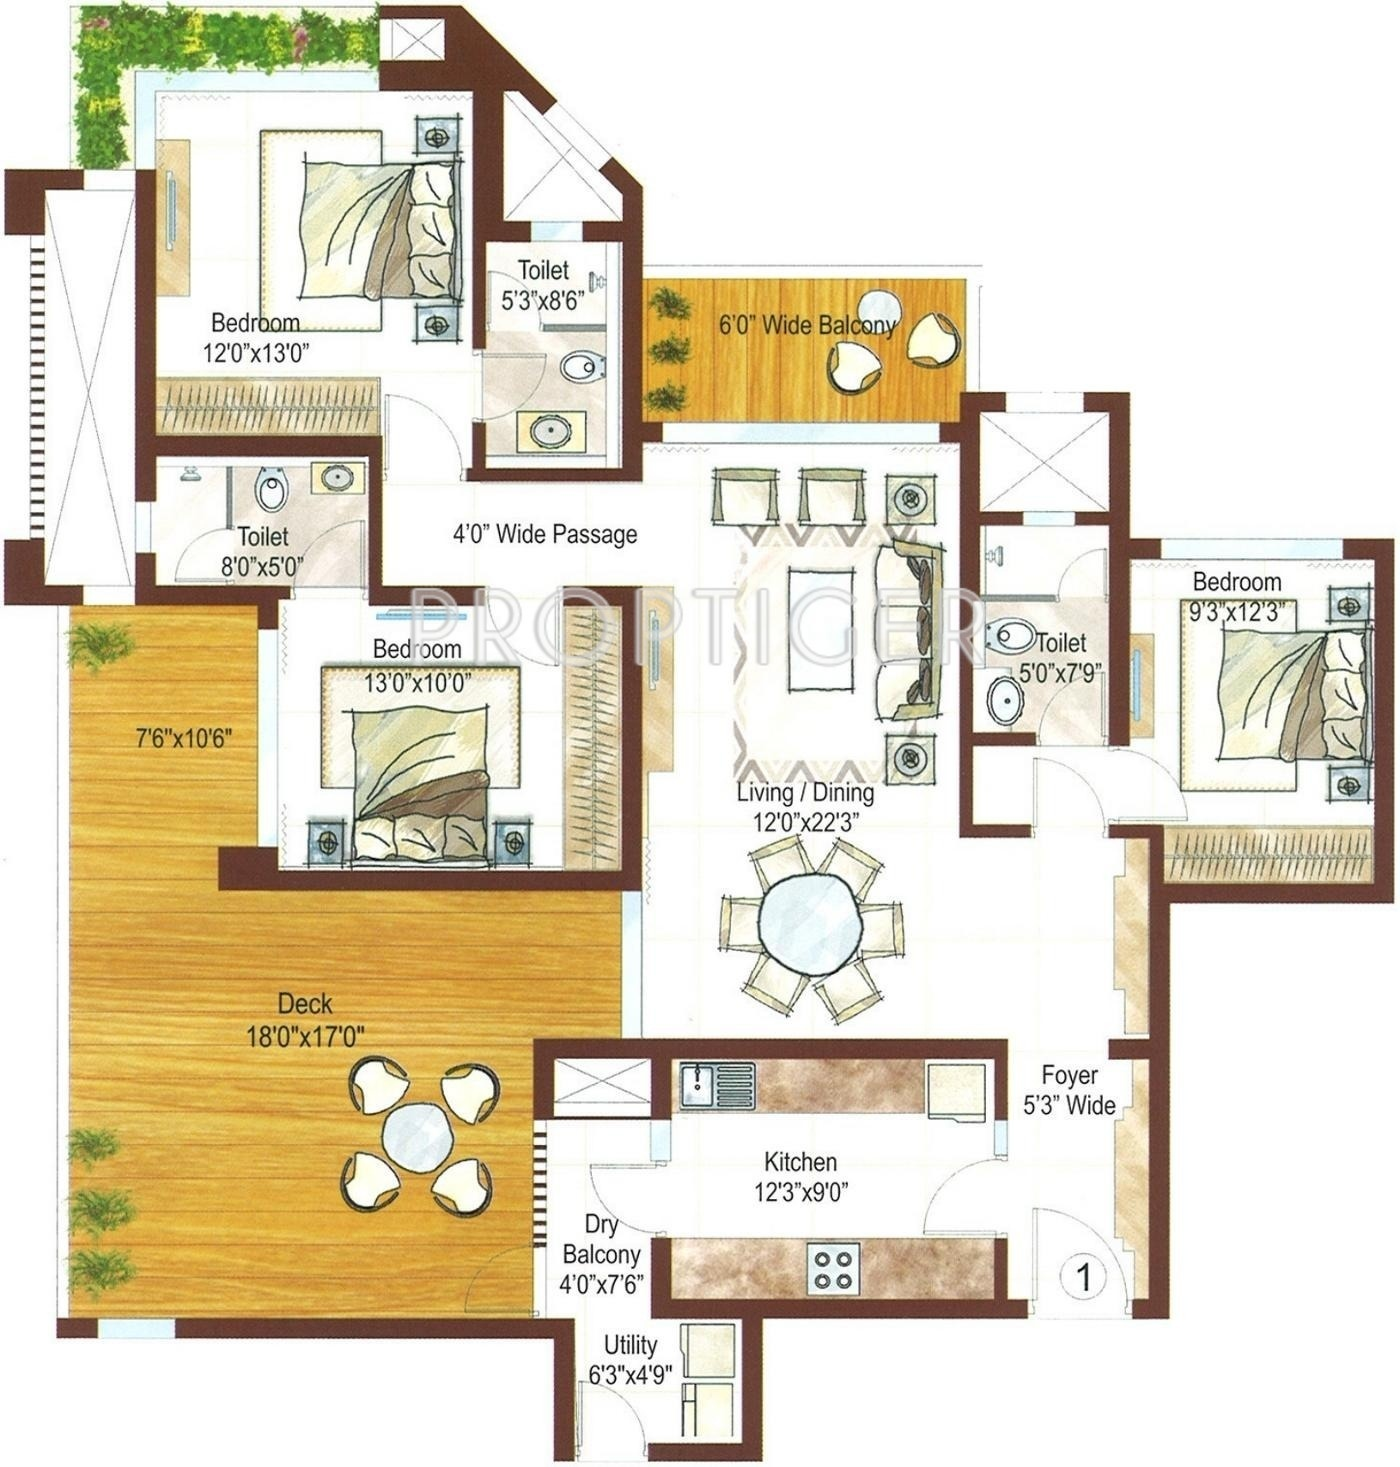 ashford royale floor plan 3bhk 3t terrace 2000 sq ft 580987 ashford ...